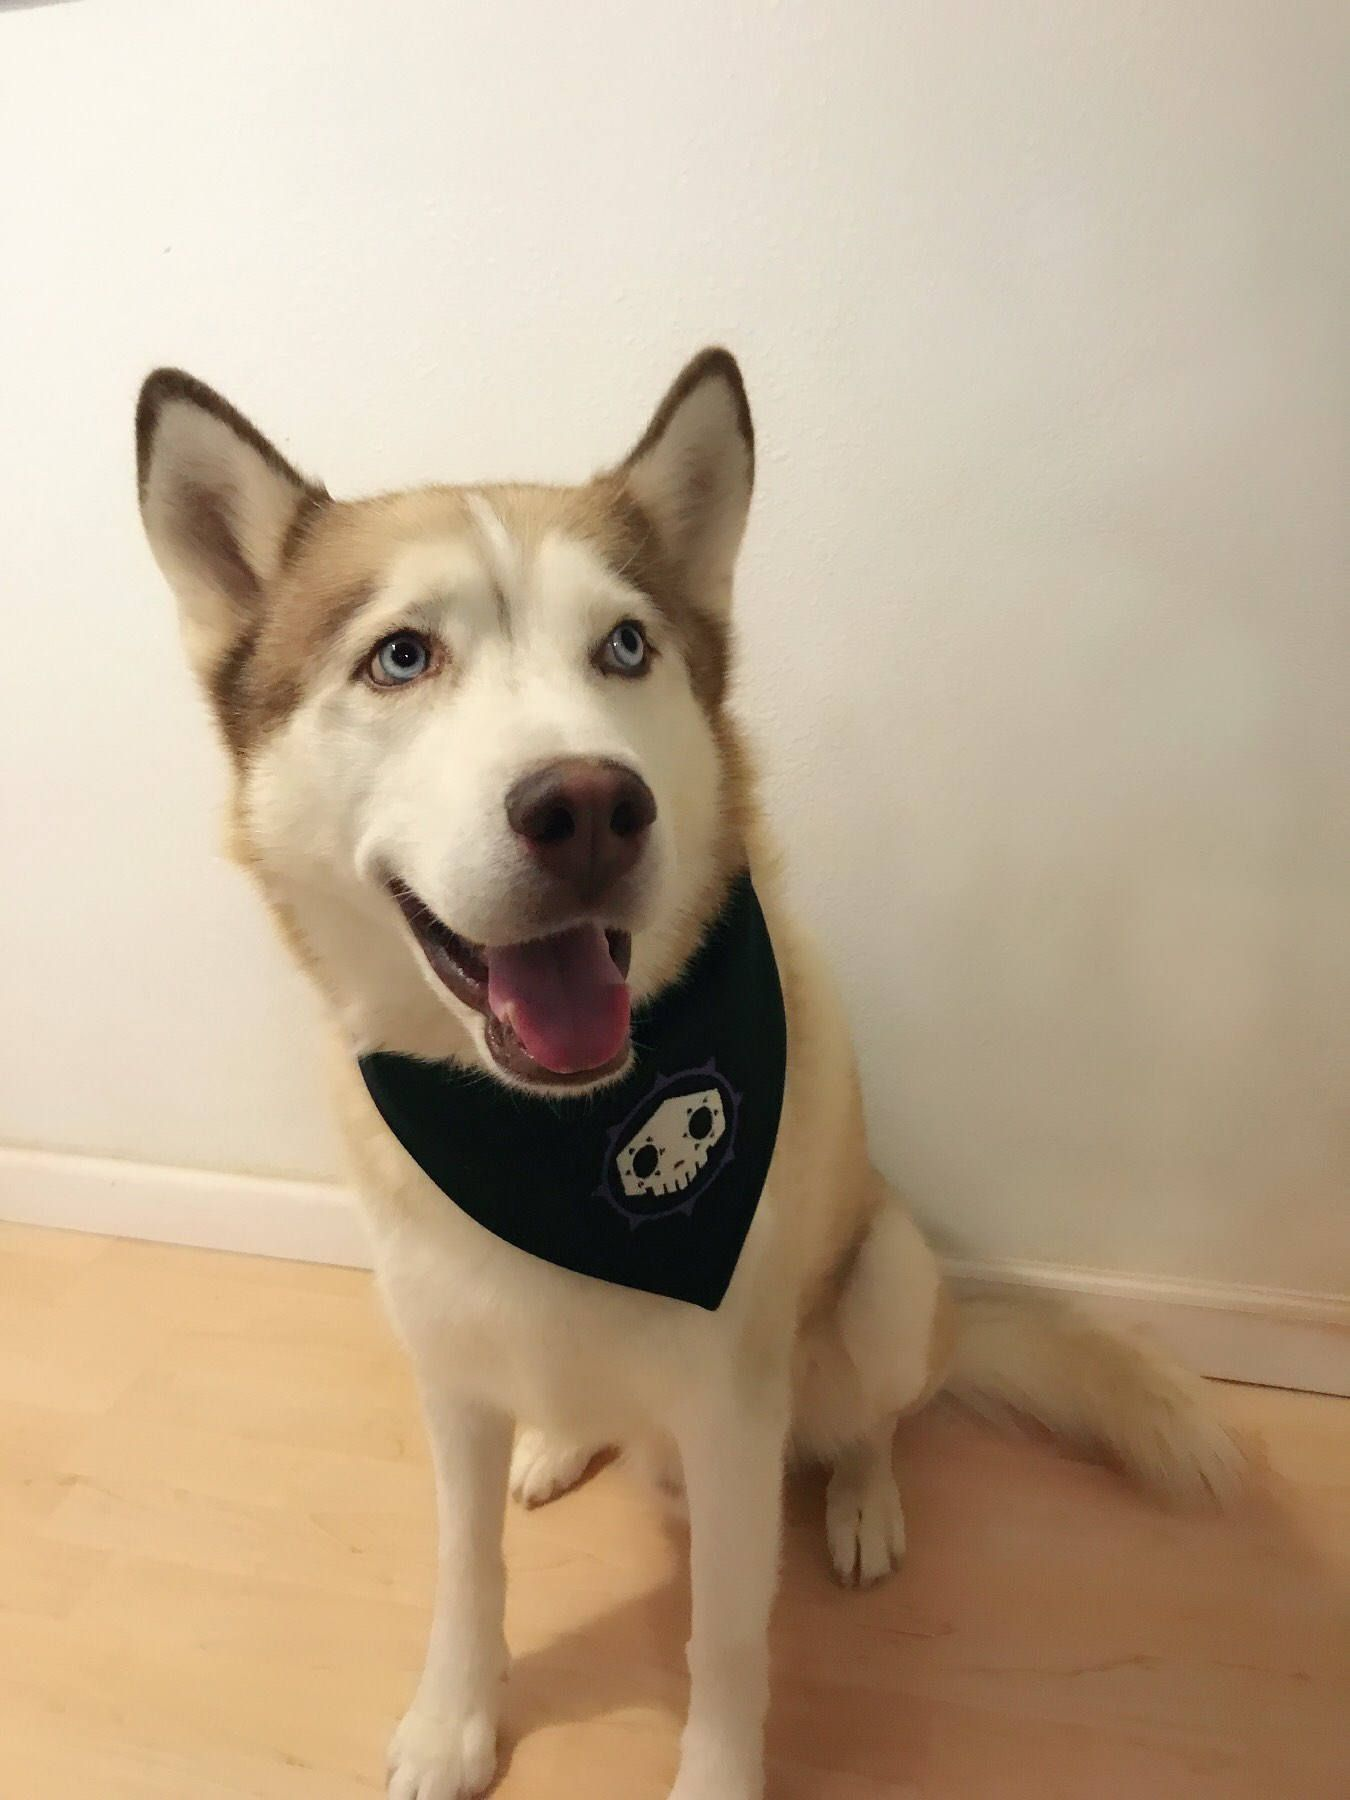 Sombra Inspired Overwatch Dog Bandana Handkerchief By